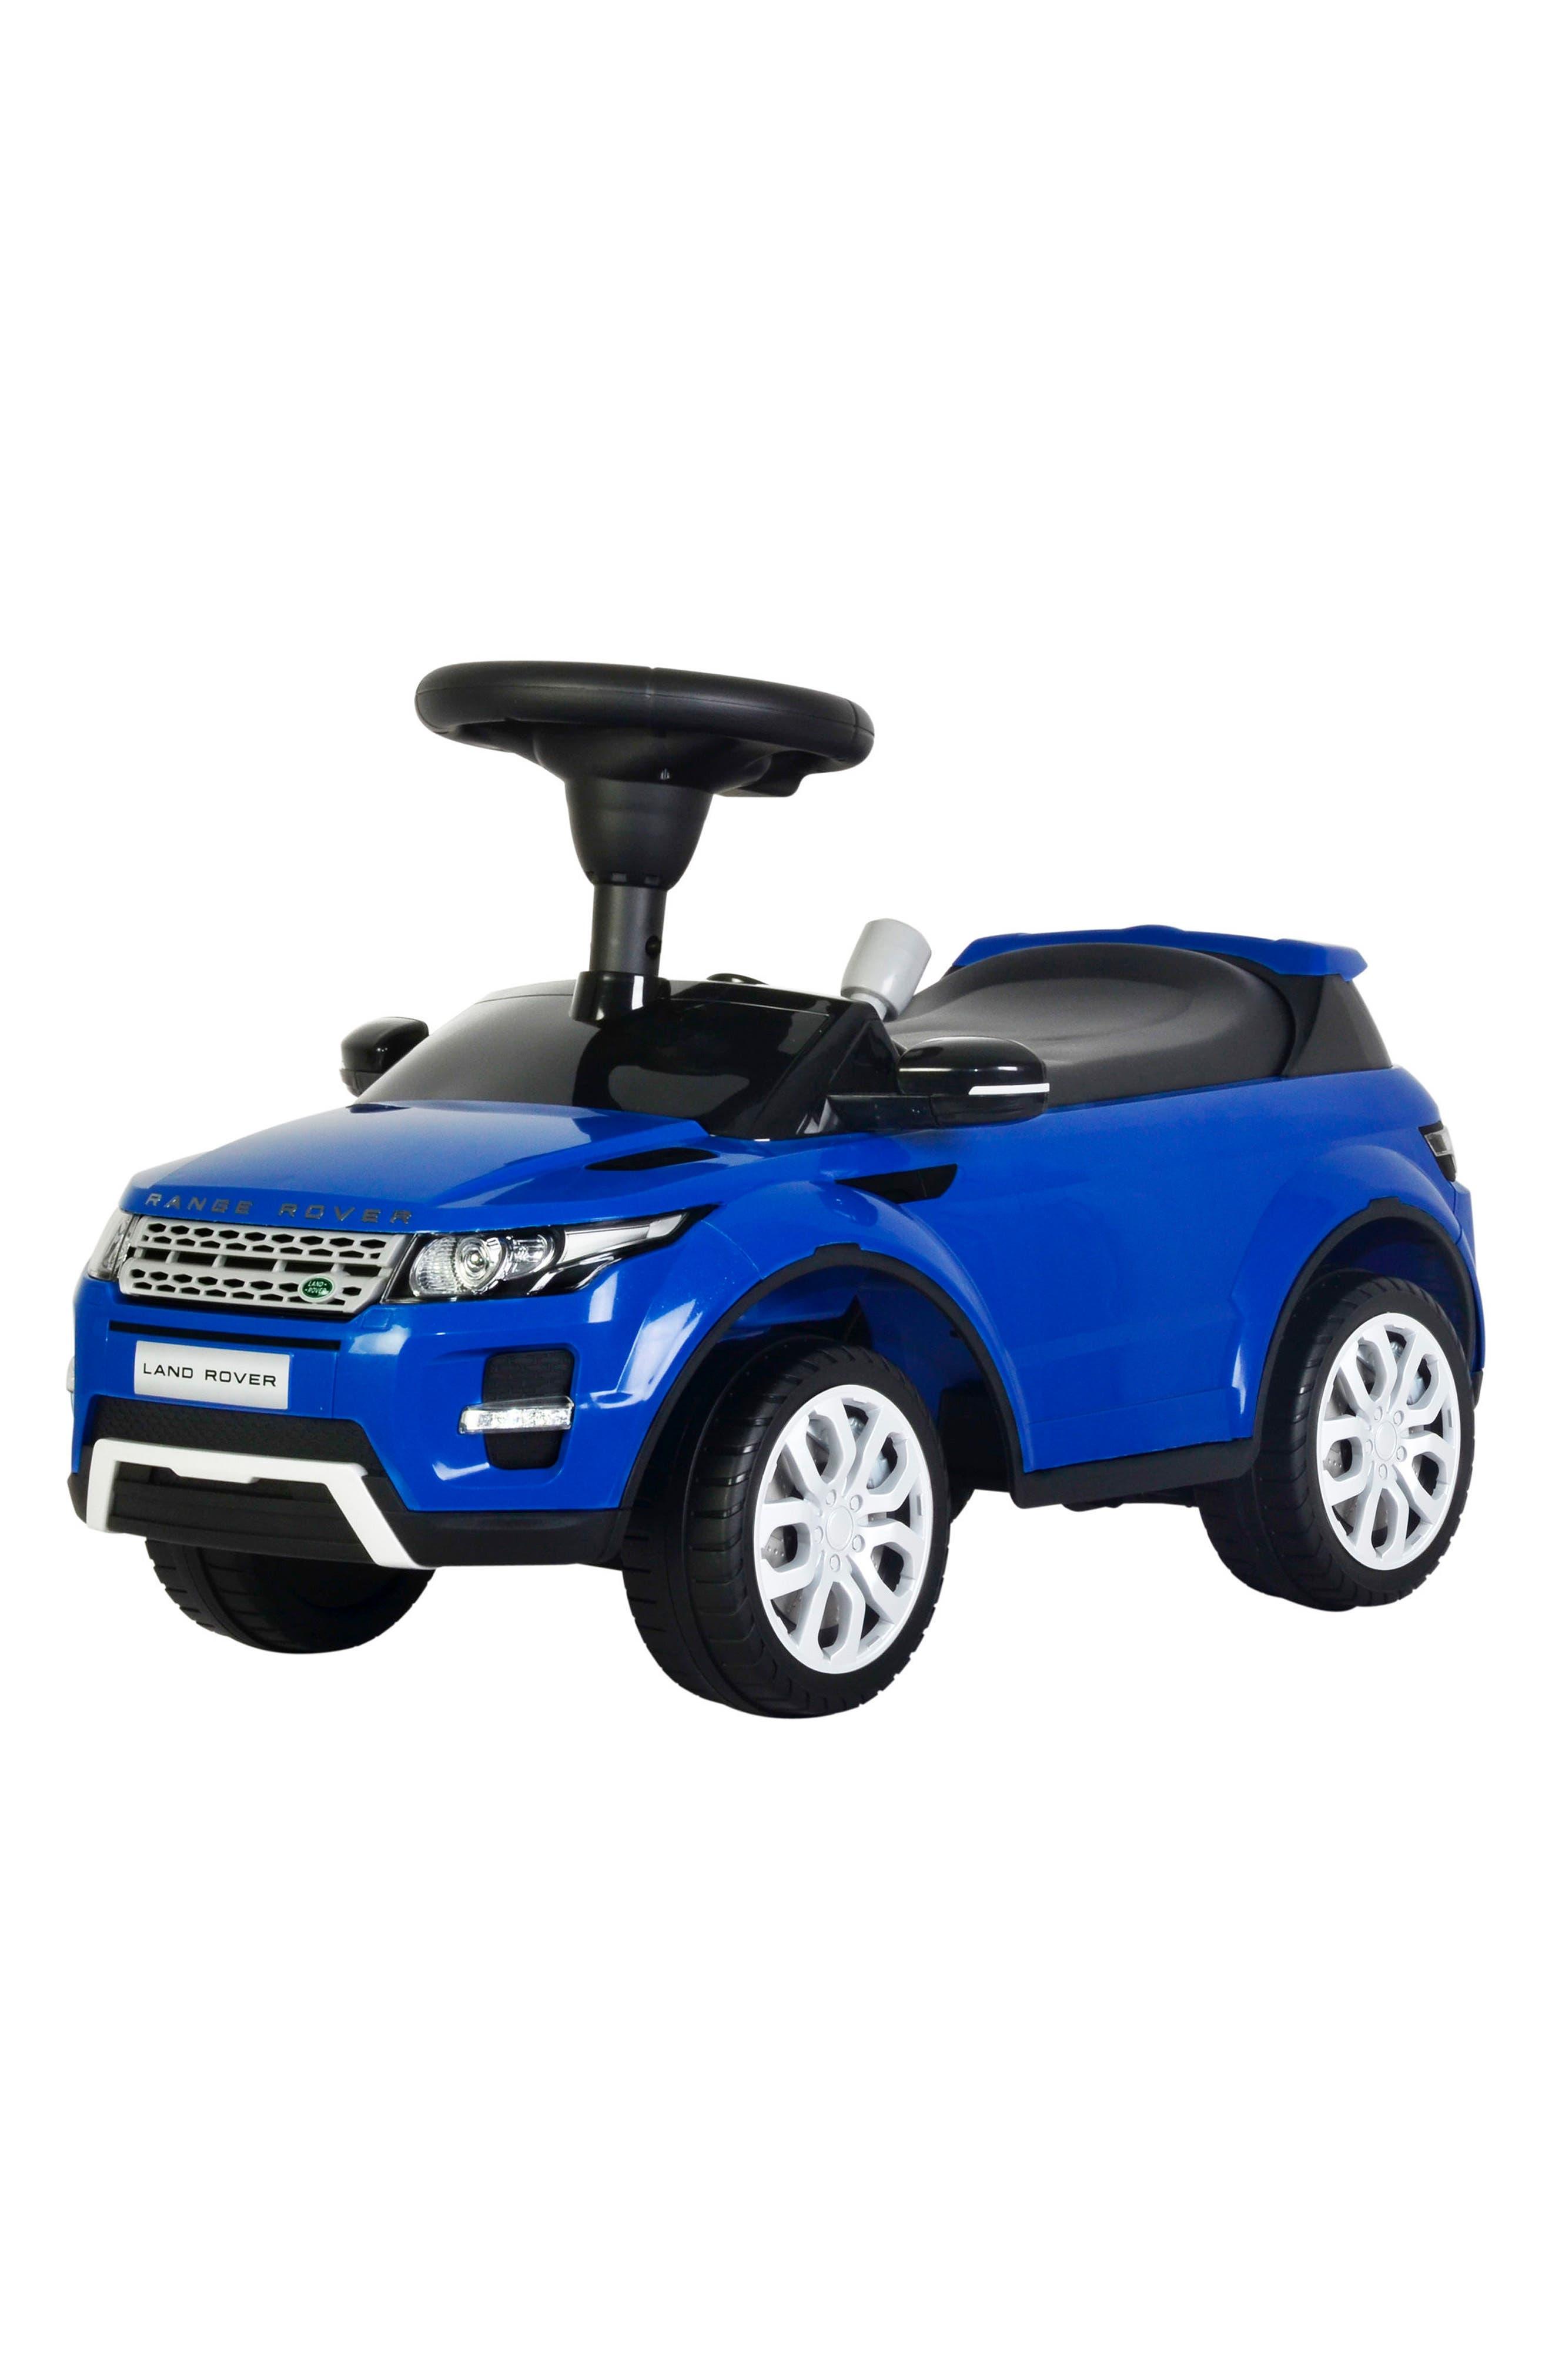 Main Image - Best Ride On Cars Range Rover Push Car